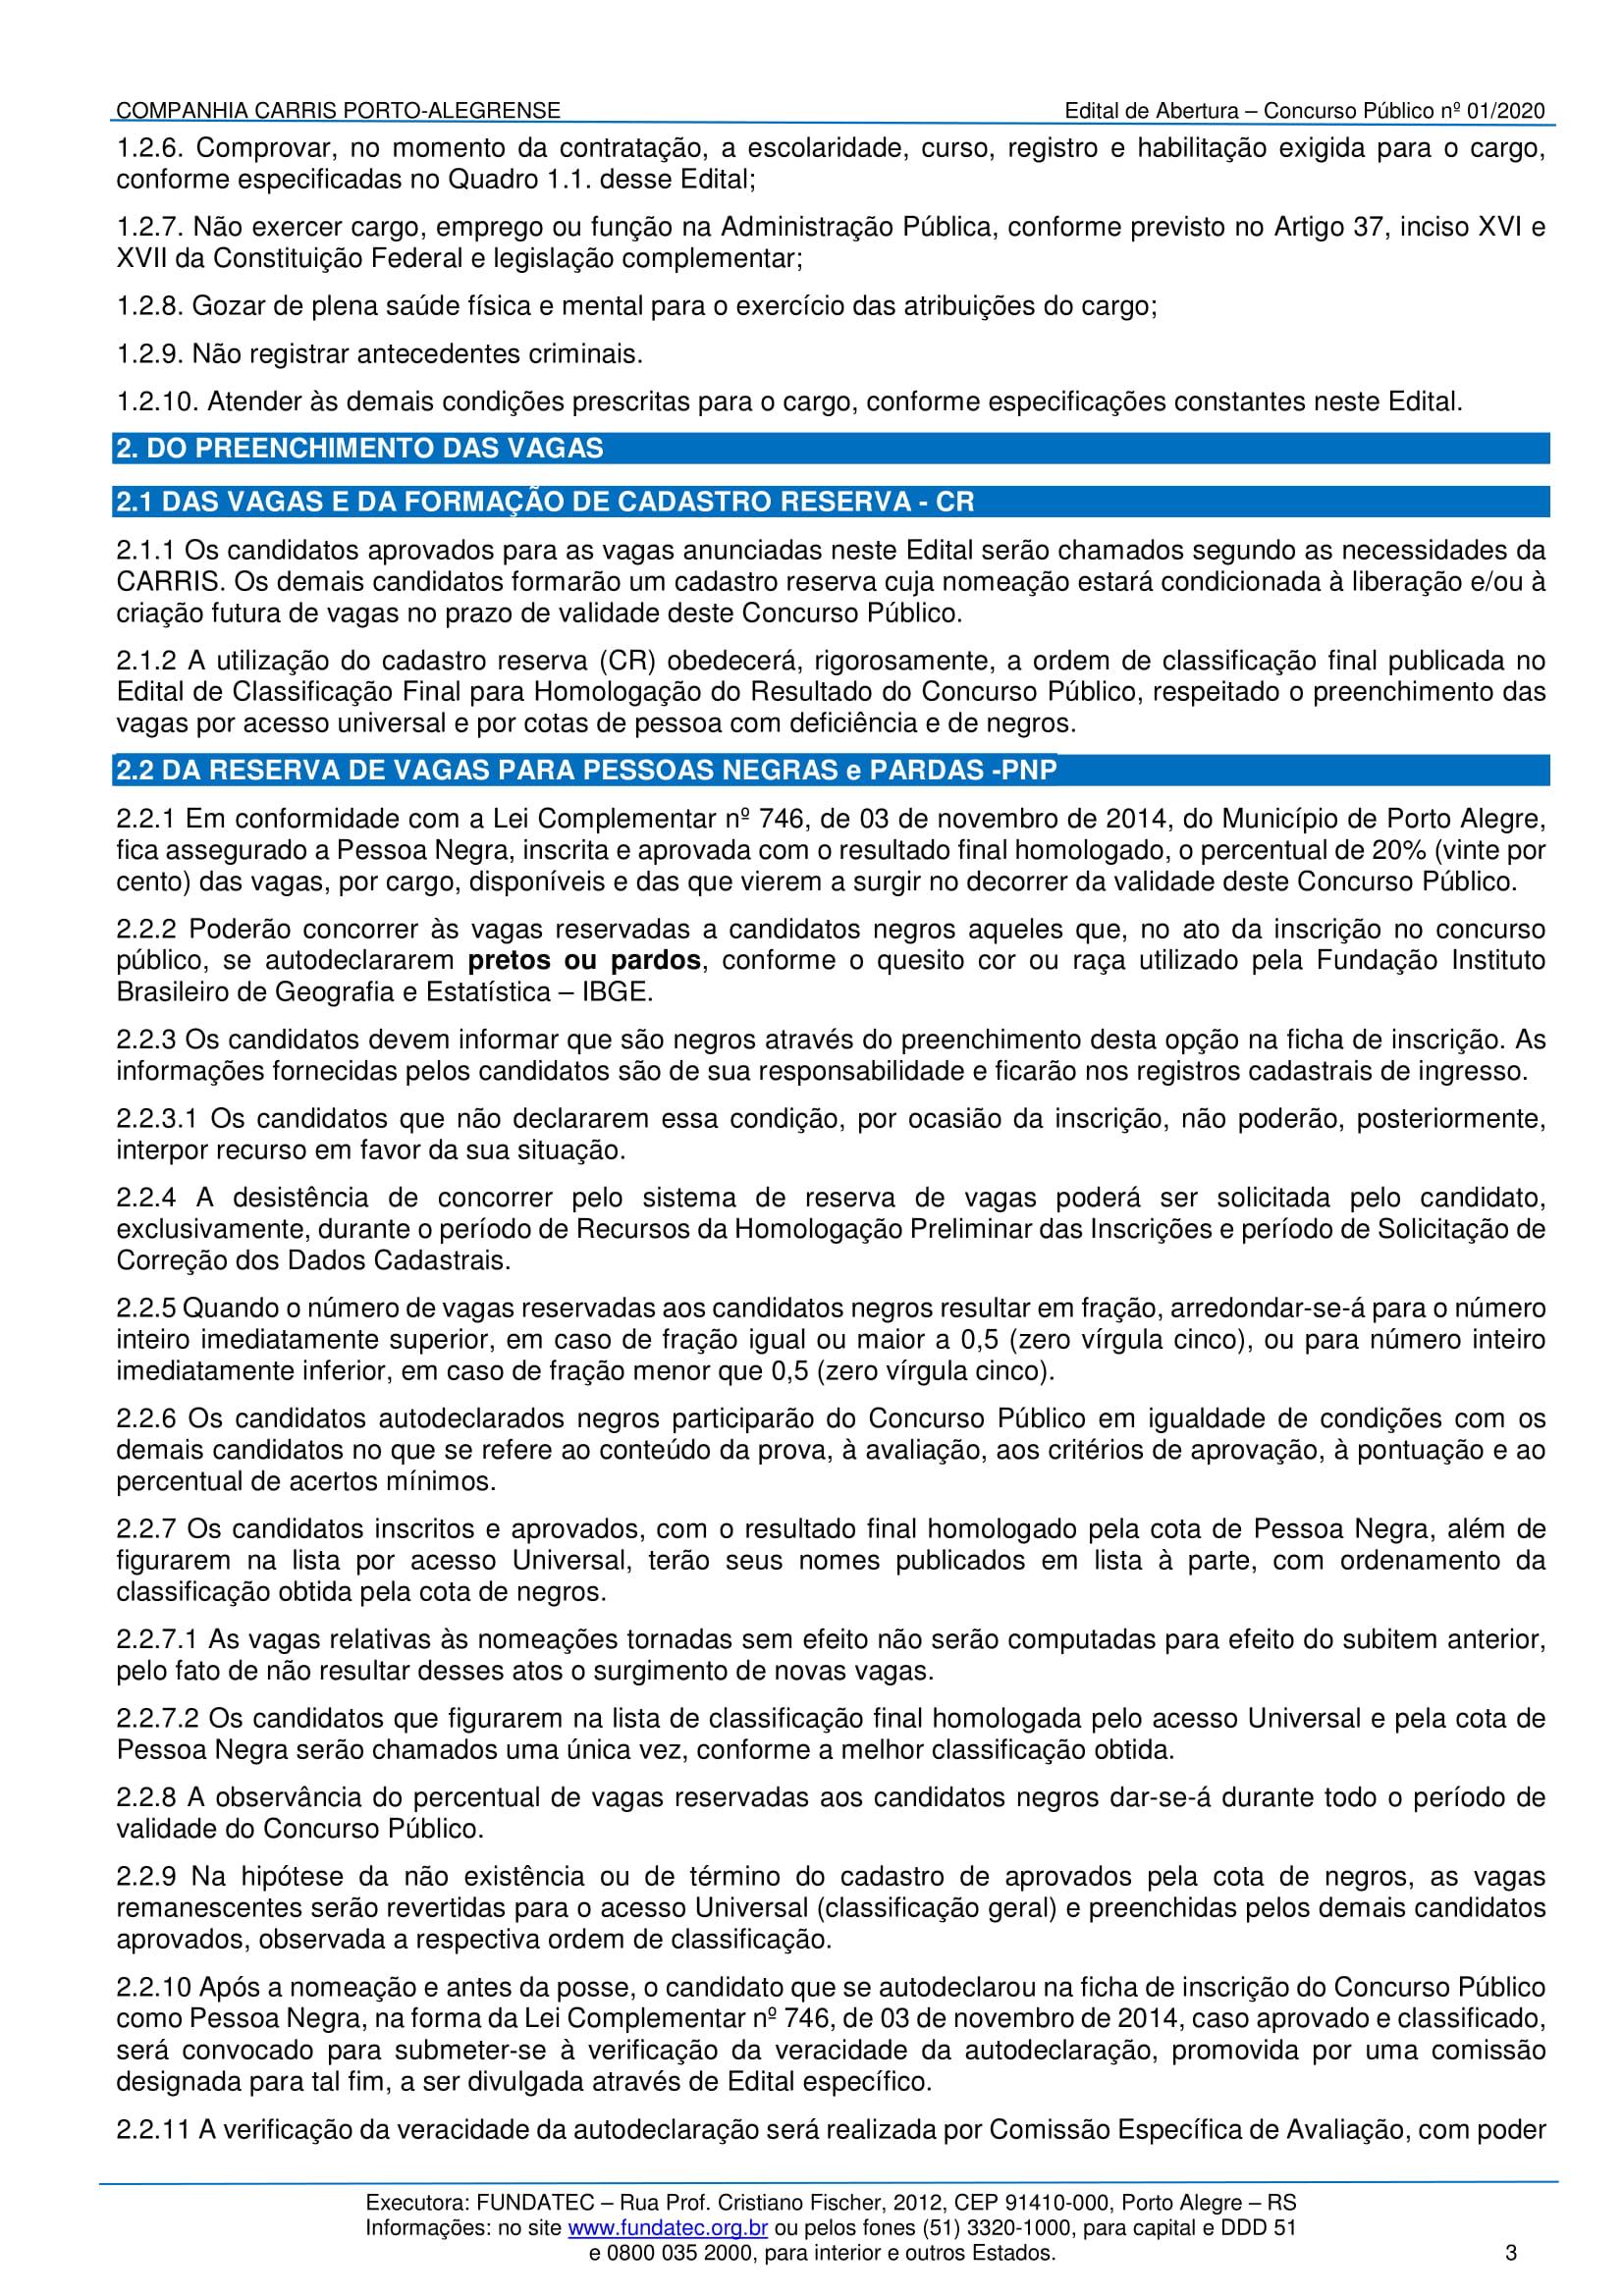 auditor-03